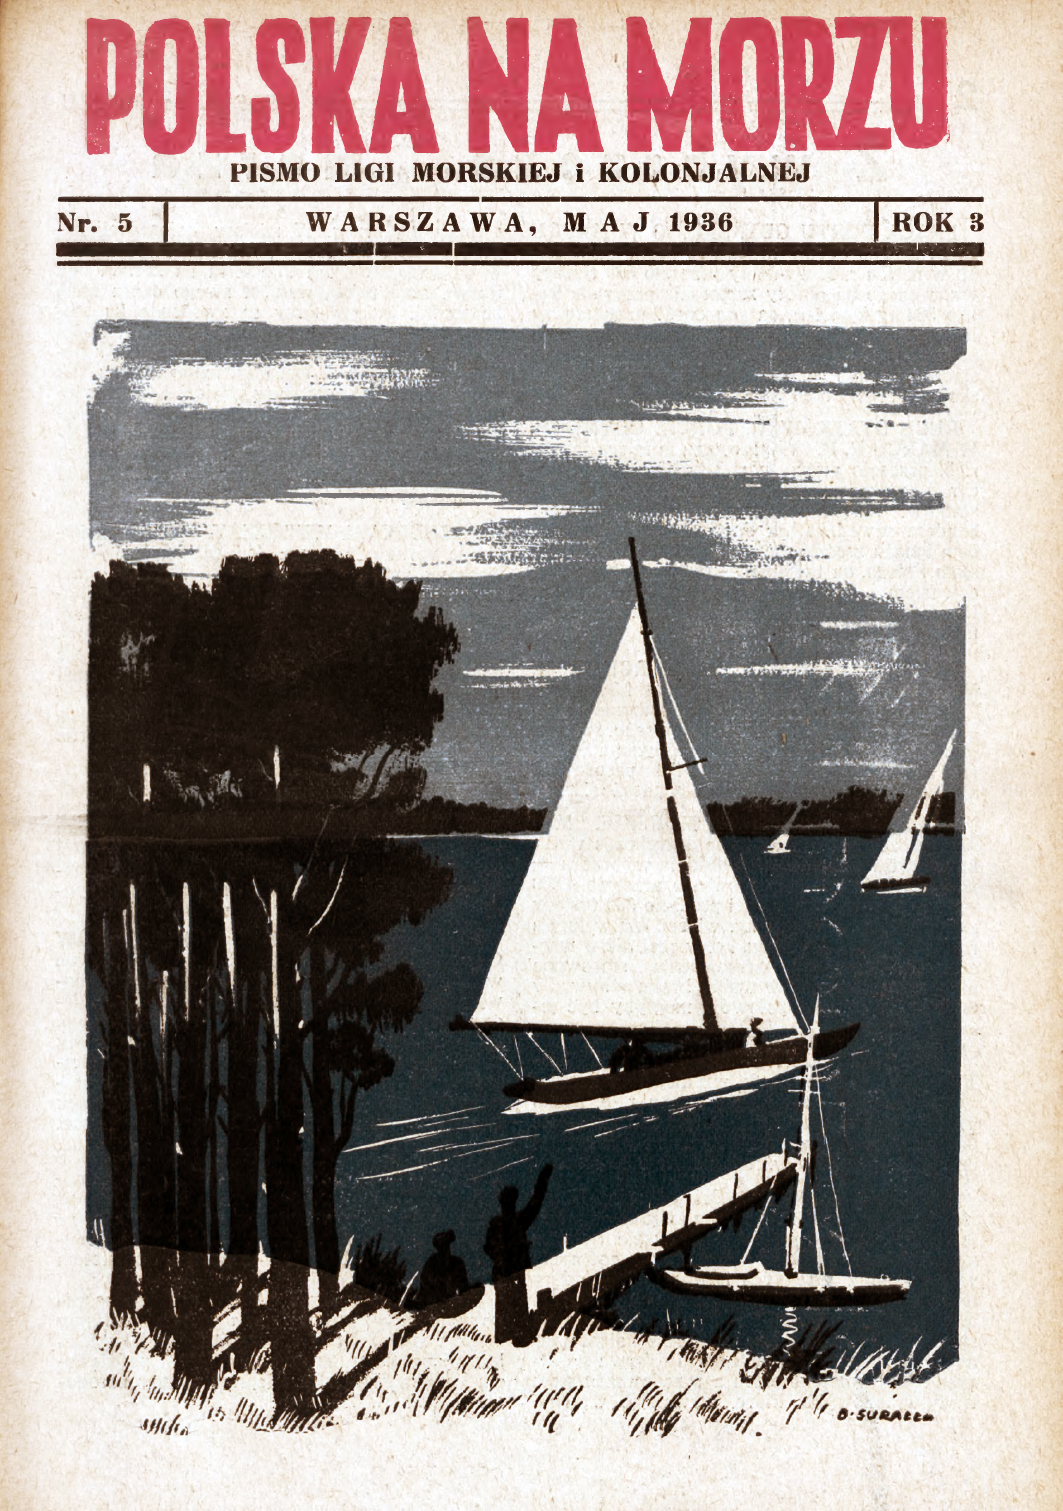 Polska na Morzu : pismo Ligi Morskiej i Kolonjalnej. - Liga Morska i Kolonjalna, 1936, nr 5